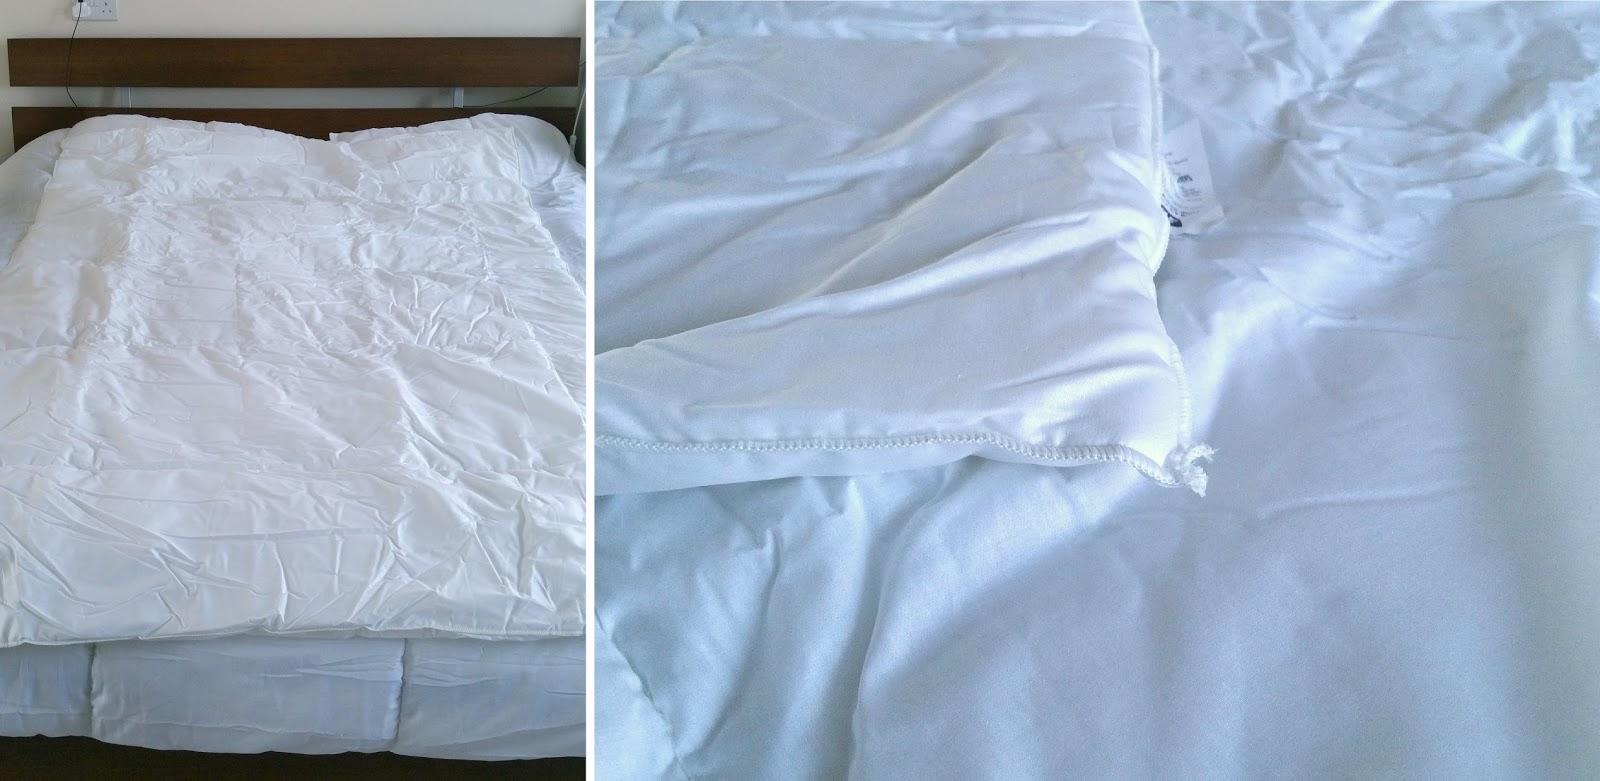 Sleepy people, Anti-allergy pillow, anti-allergy duvet